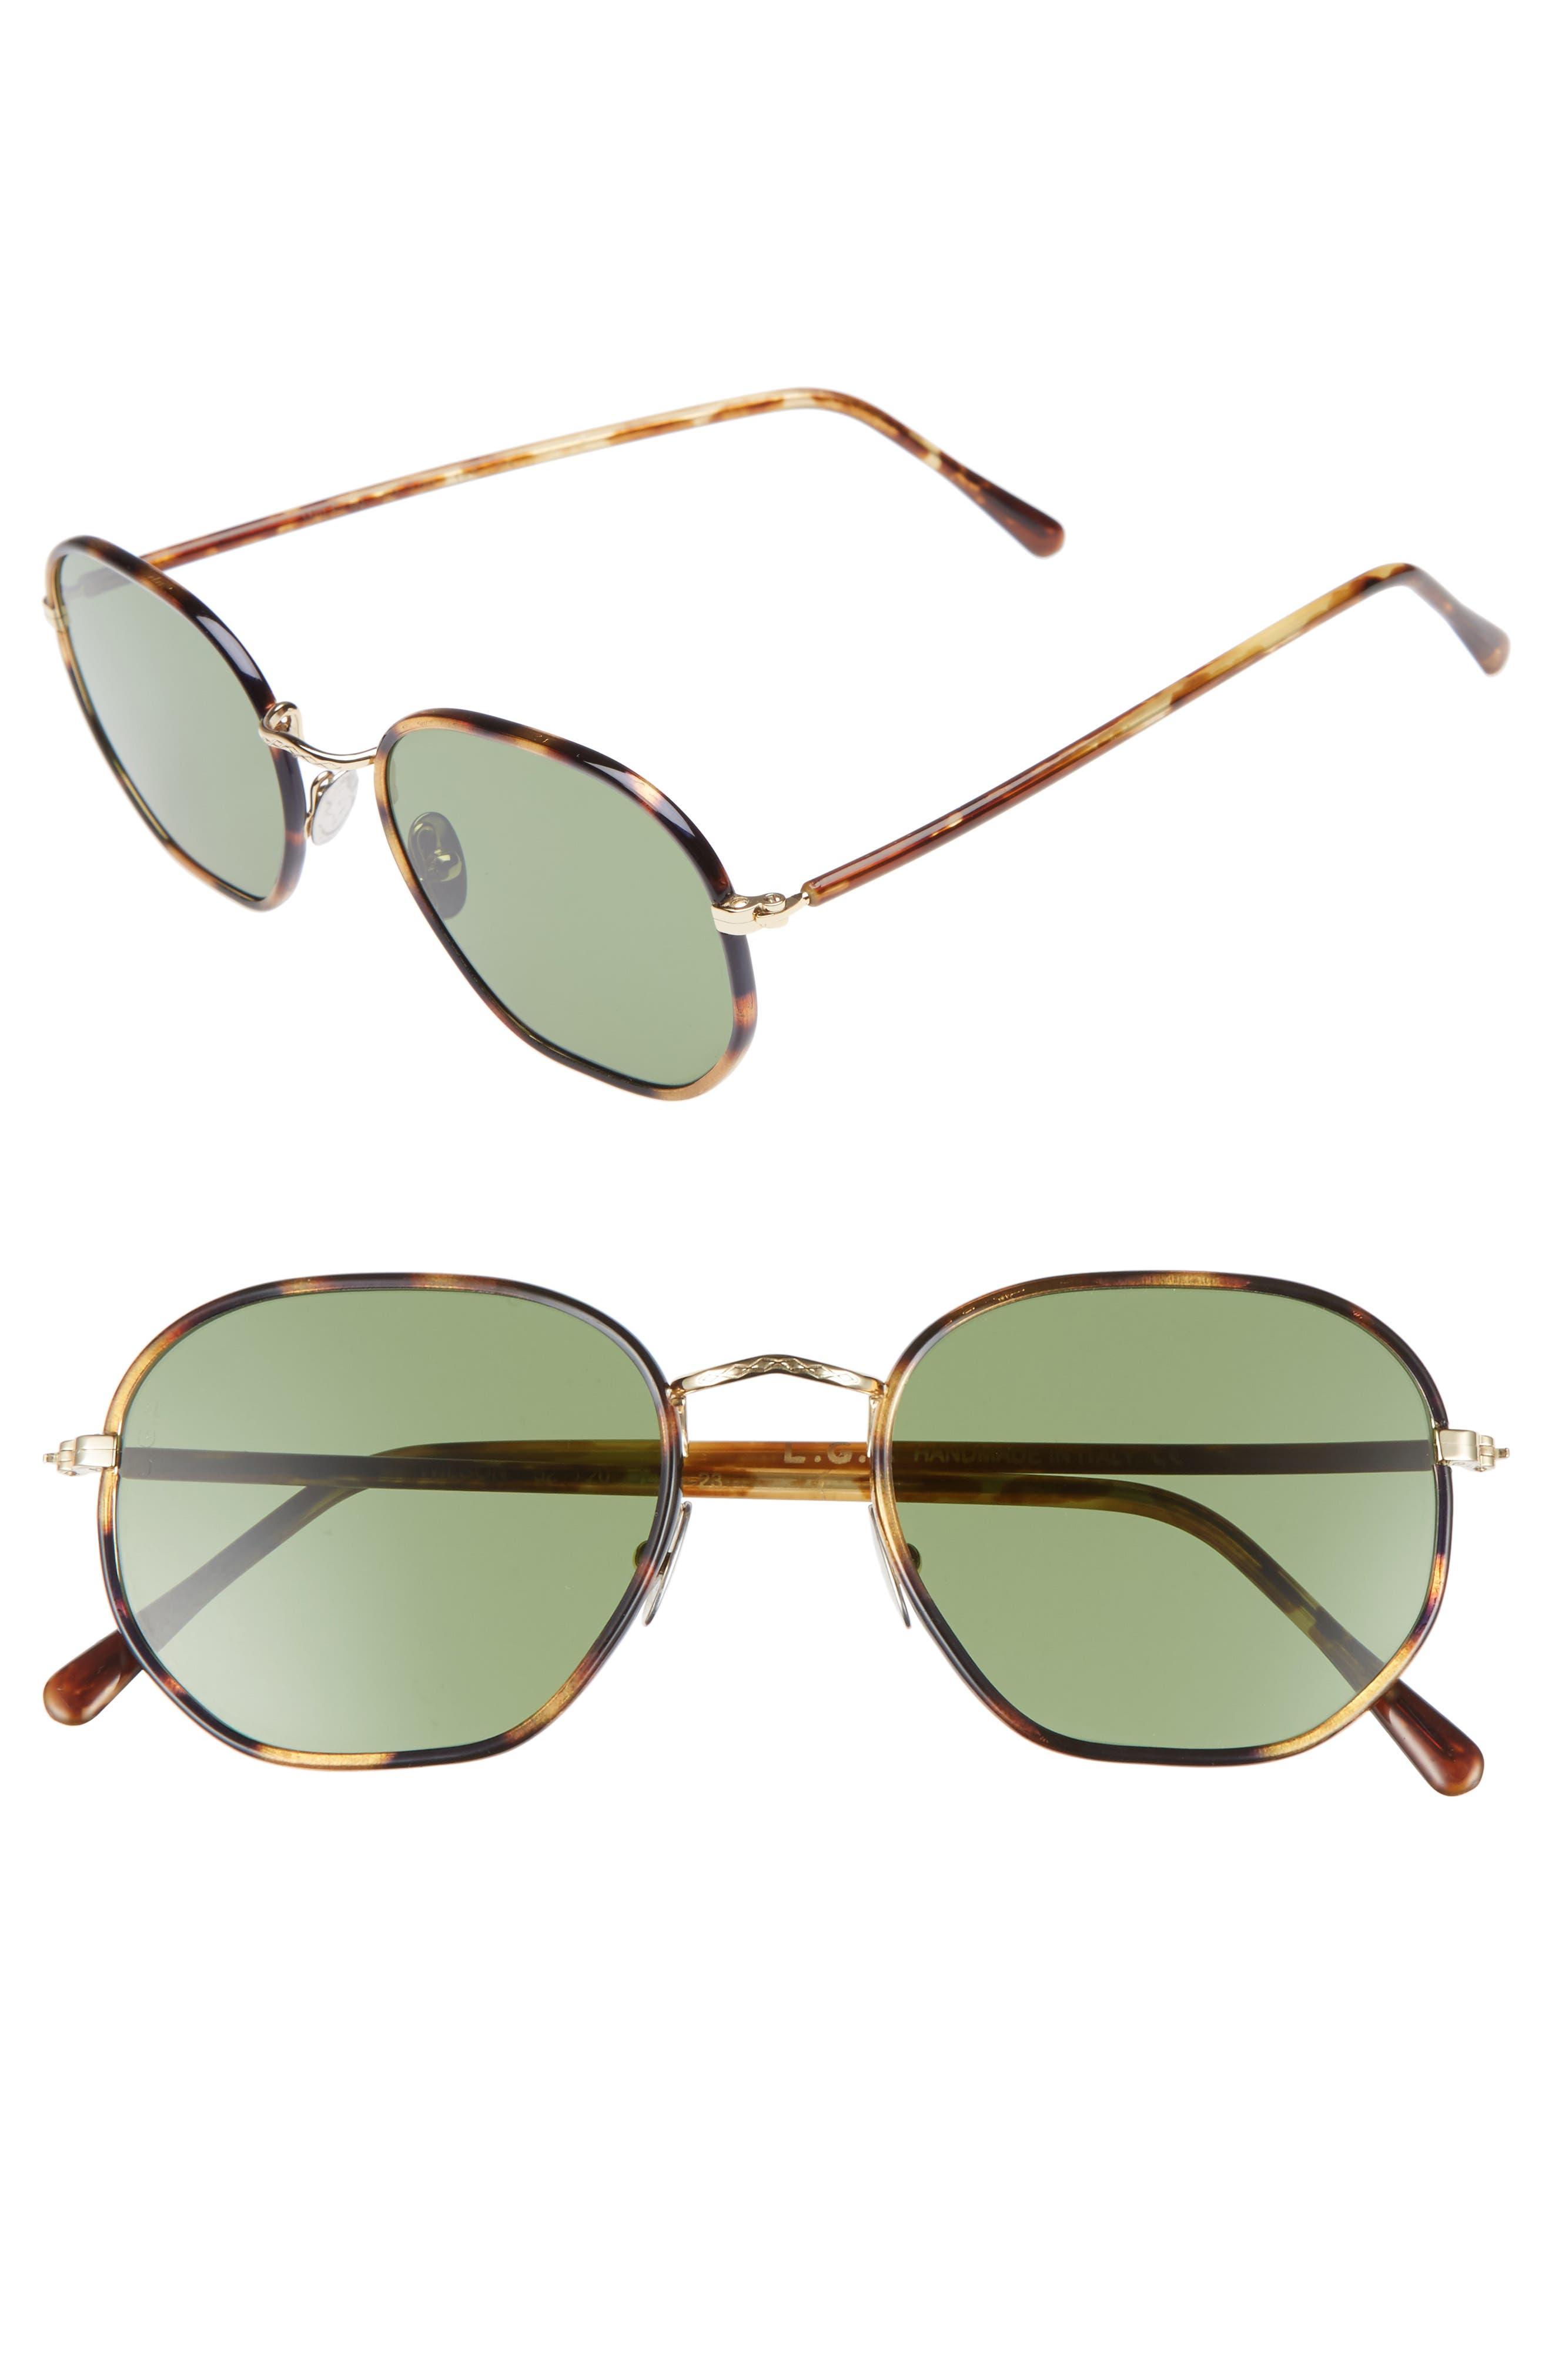 Main Image - L.G.R Wilson 52mm Sunglasses